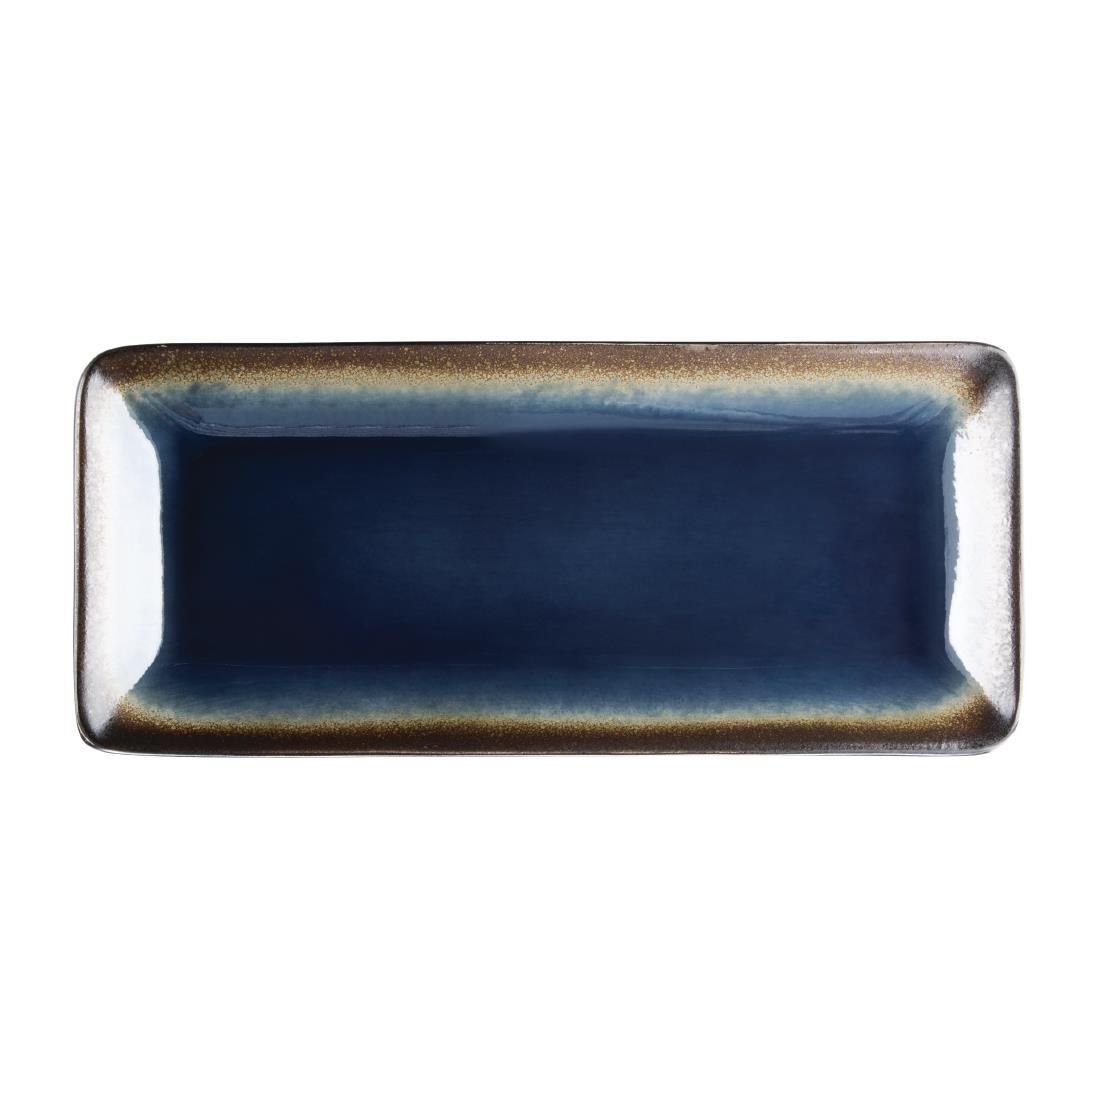 Tapas Rectangular Plate - Blue